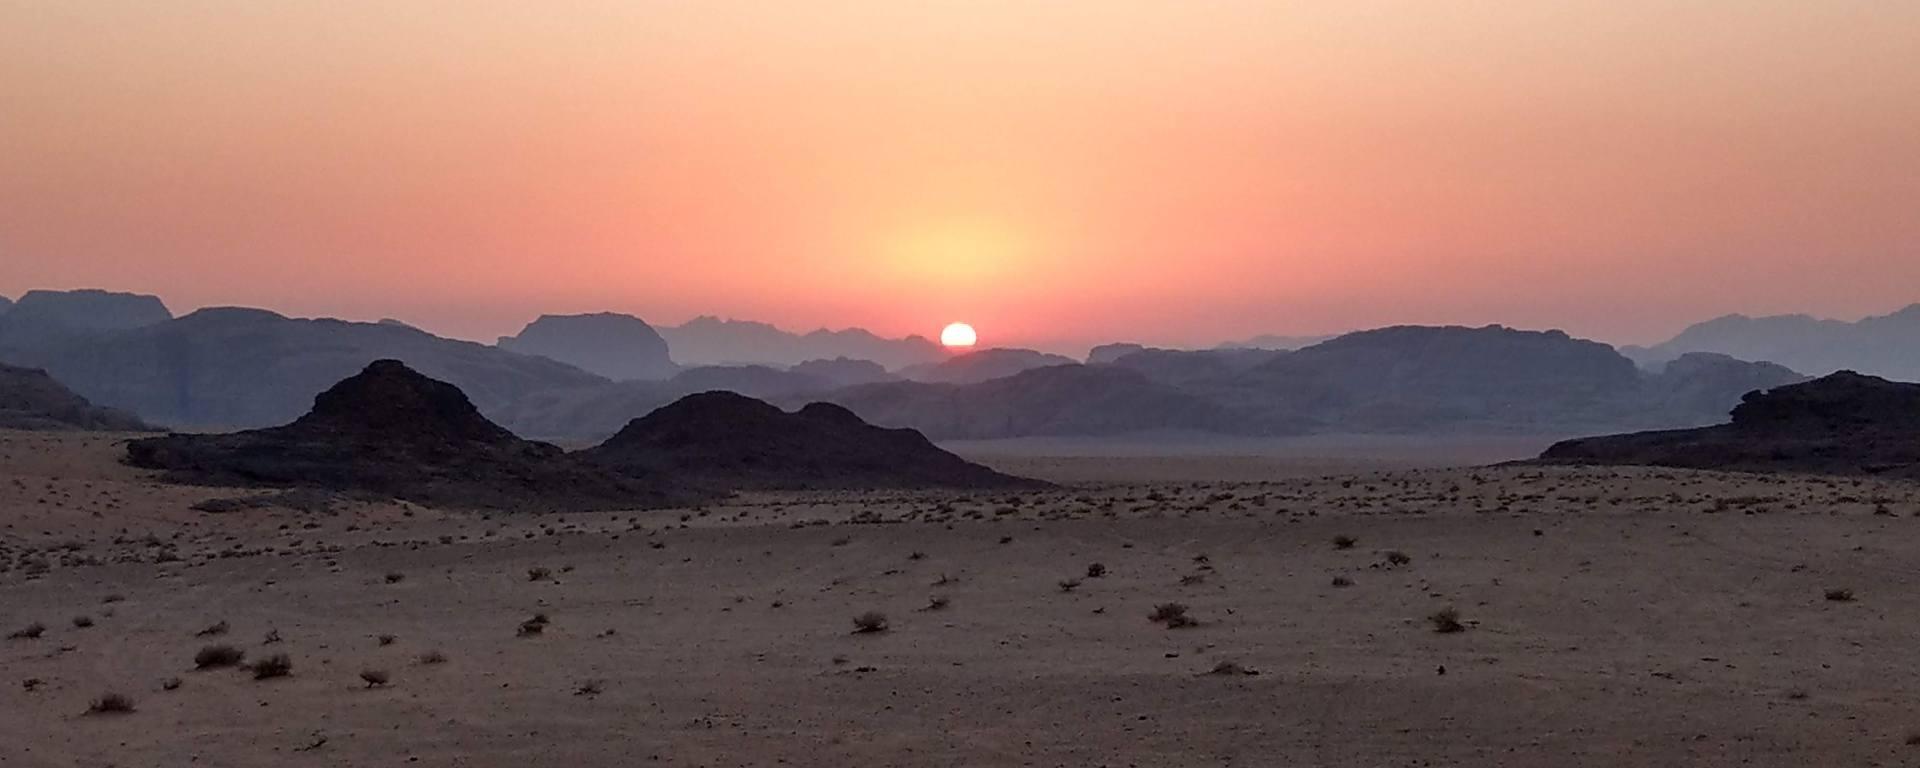 Sunset on Wadi Rum